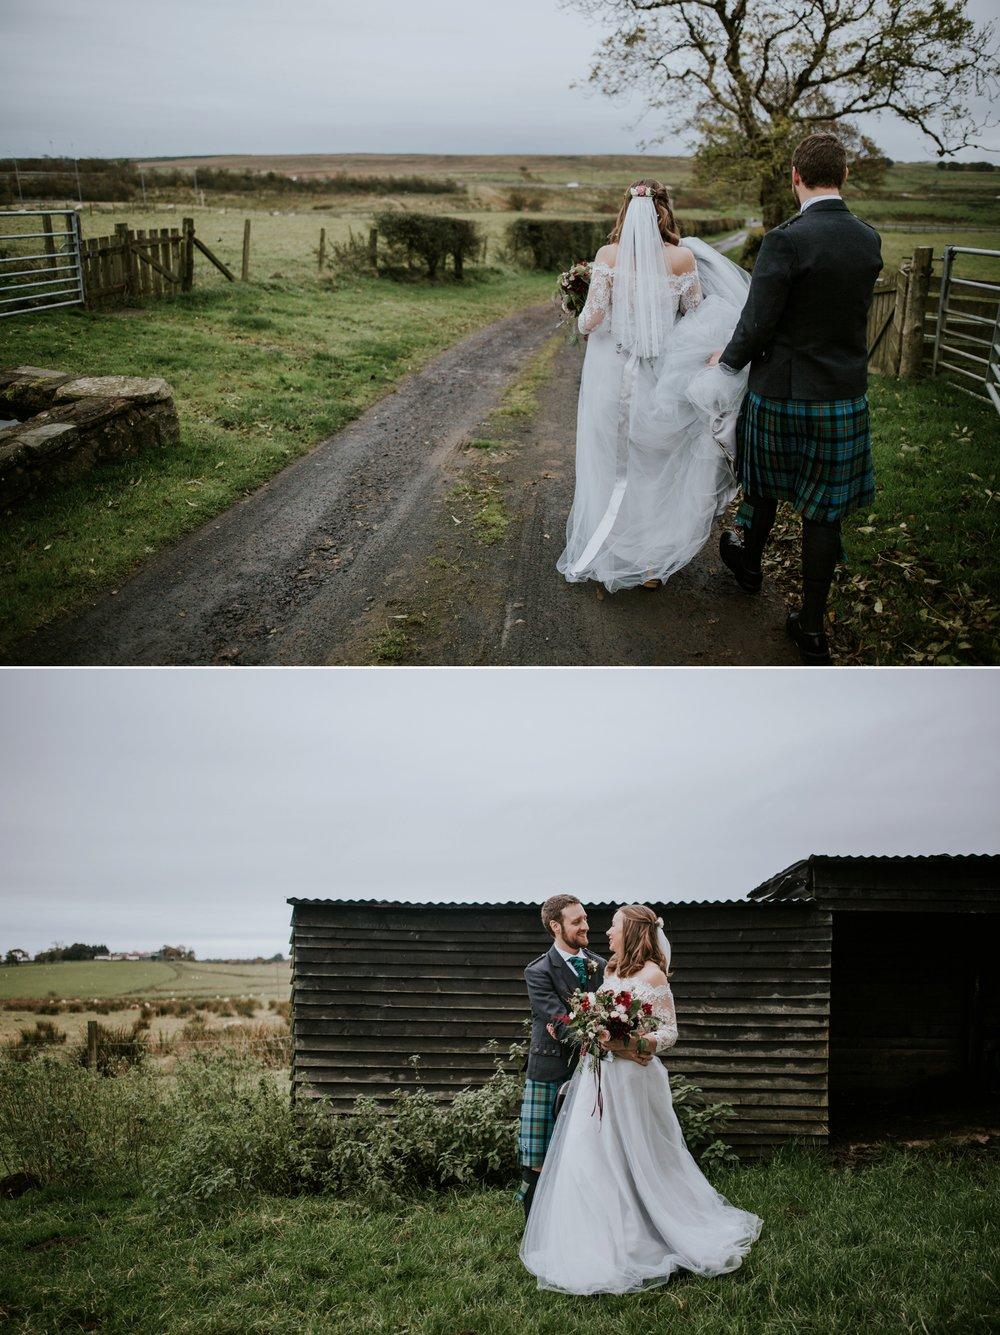 HarelawFarm_Ayrshire_Nuala&Colin_IntheNameofLovePhotography_0117.jpg